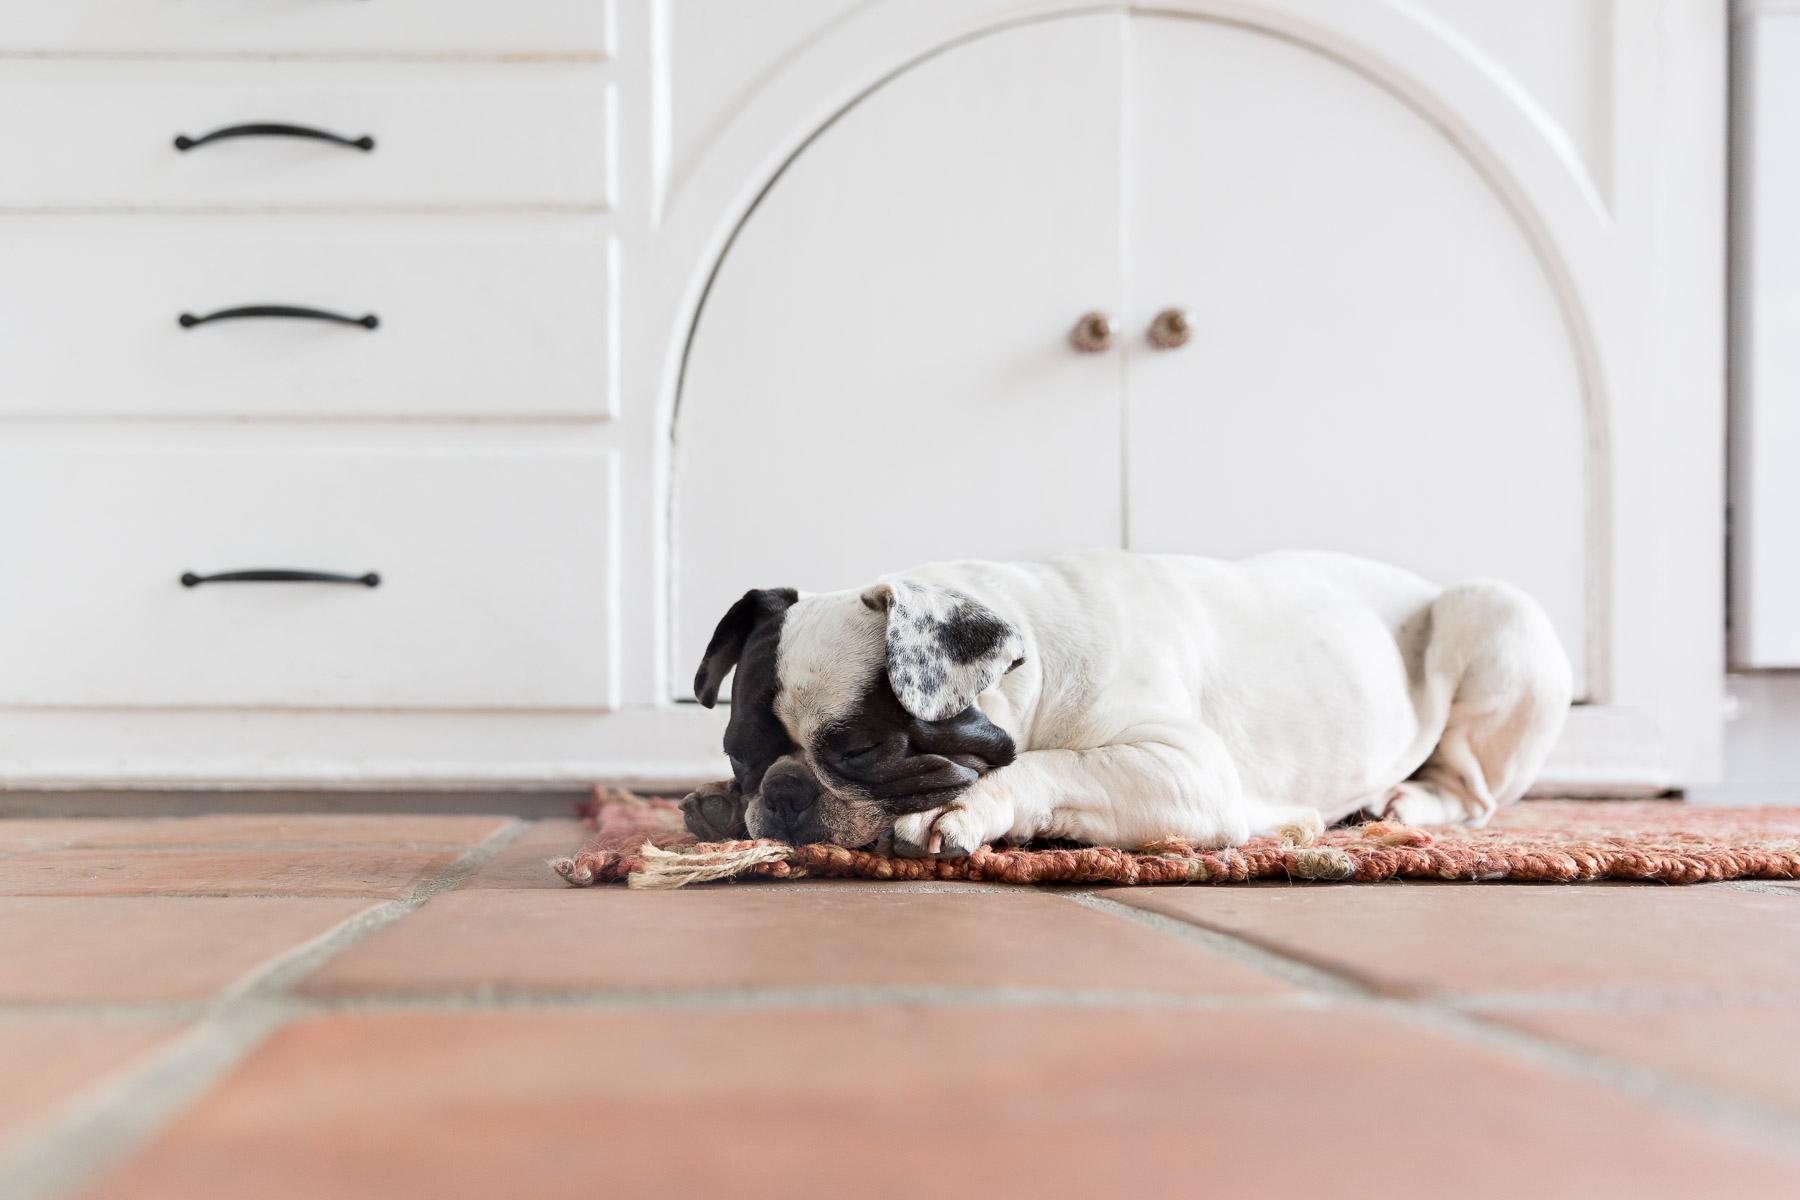 french-bulldog-sleeping-on-rug-dog-photo-pet-photographer.jpg